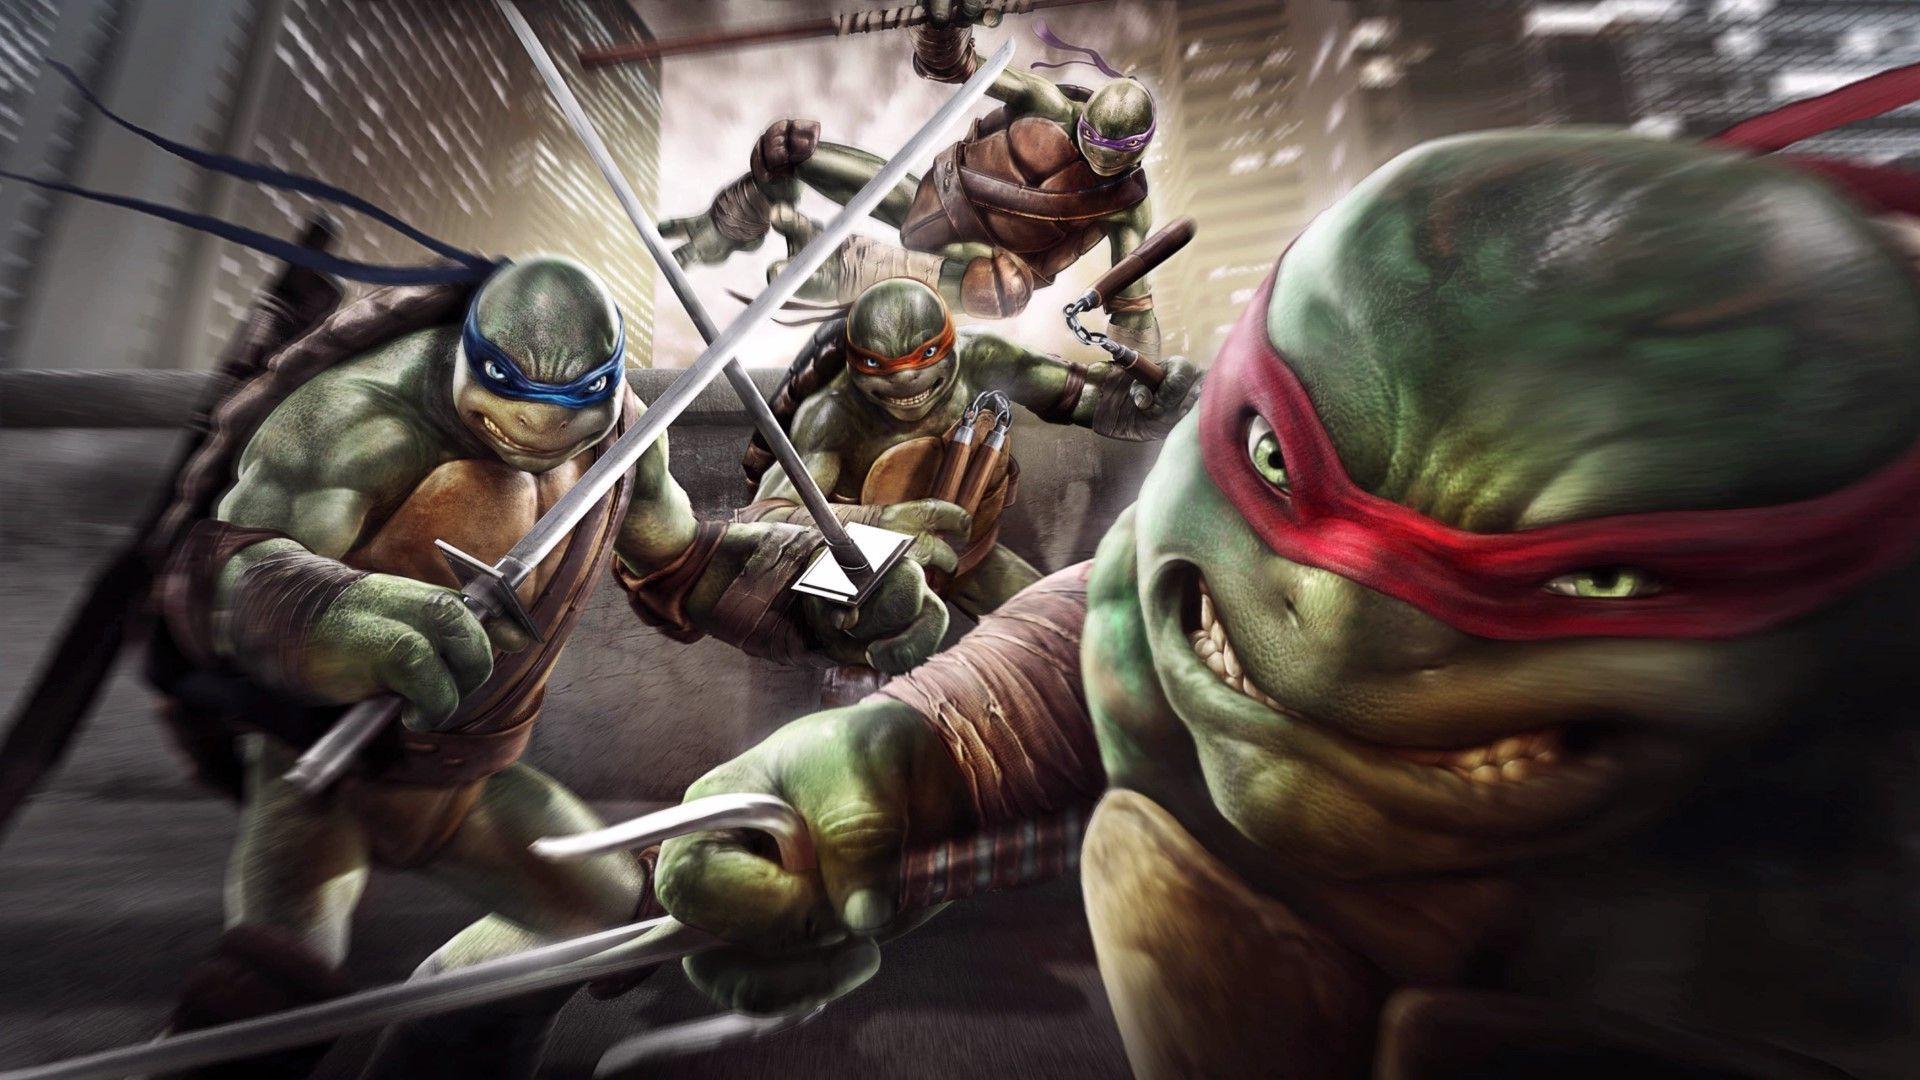 Download .torrent - Teenage Mutant Ninja Turtles 2014 - http://torrentsmovies.net/action/teenage-mutant-ninja-turtles-2014.html